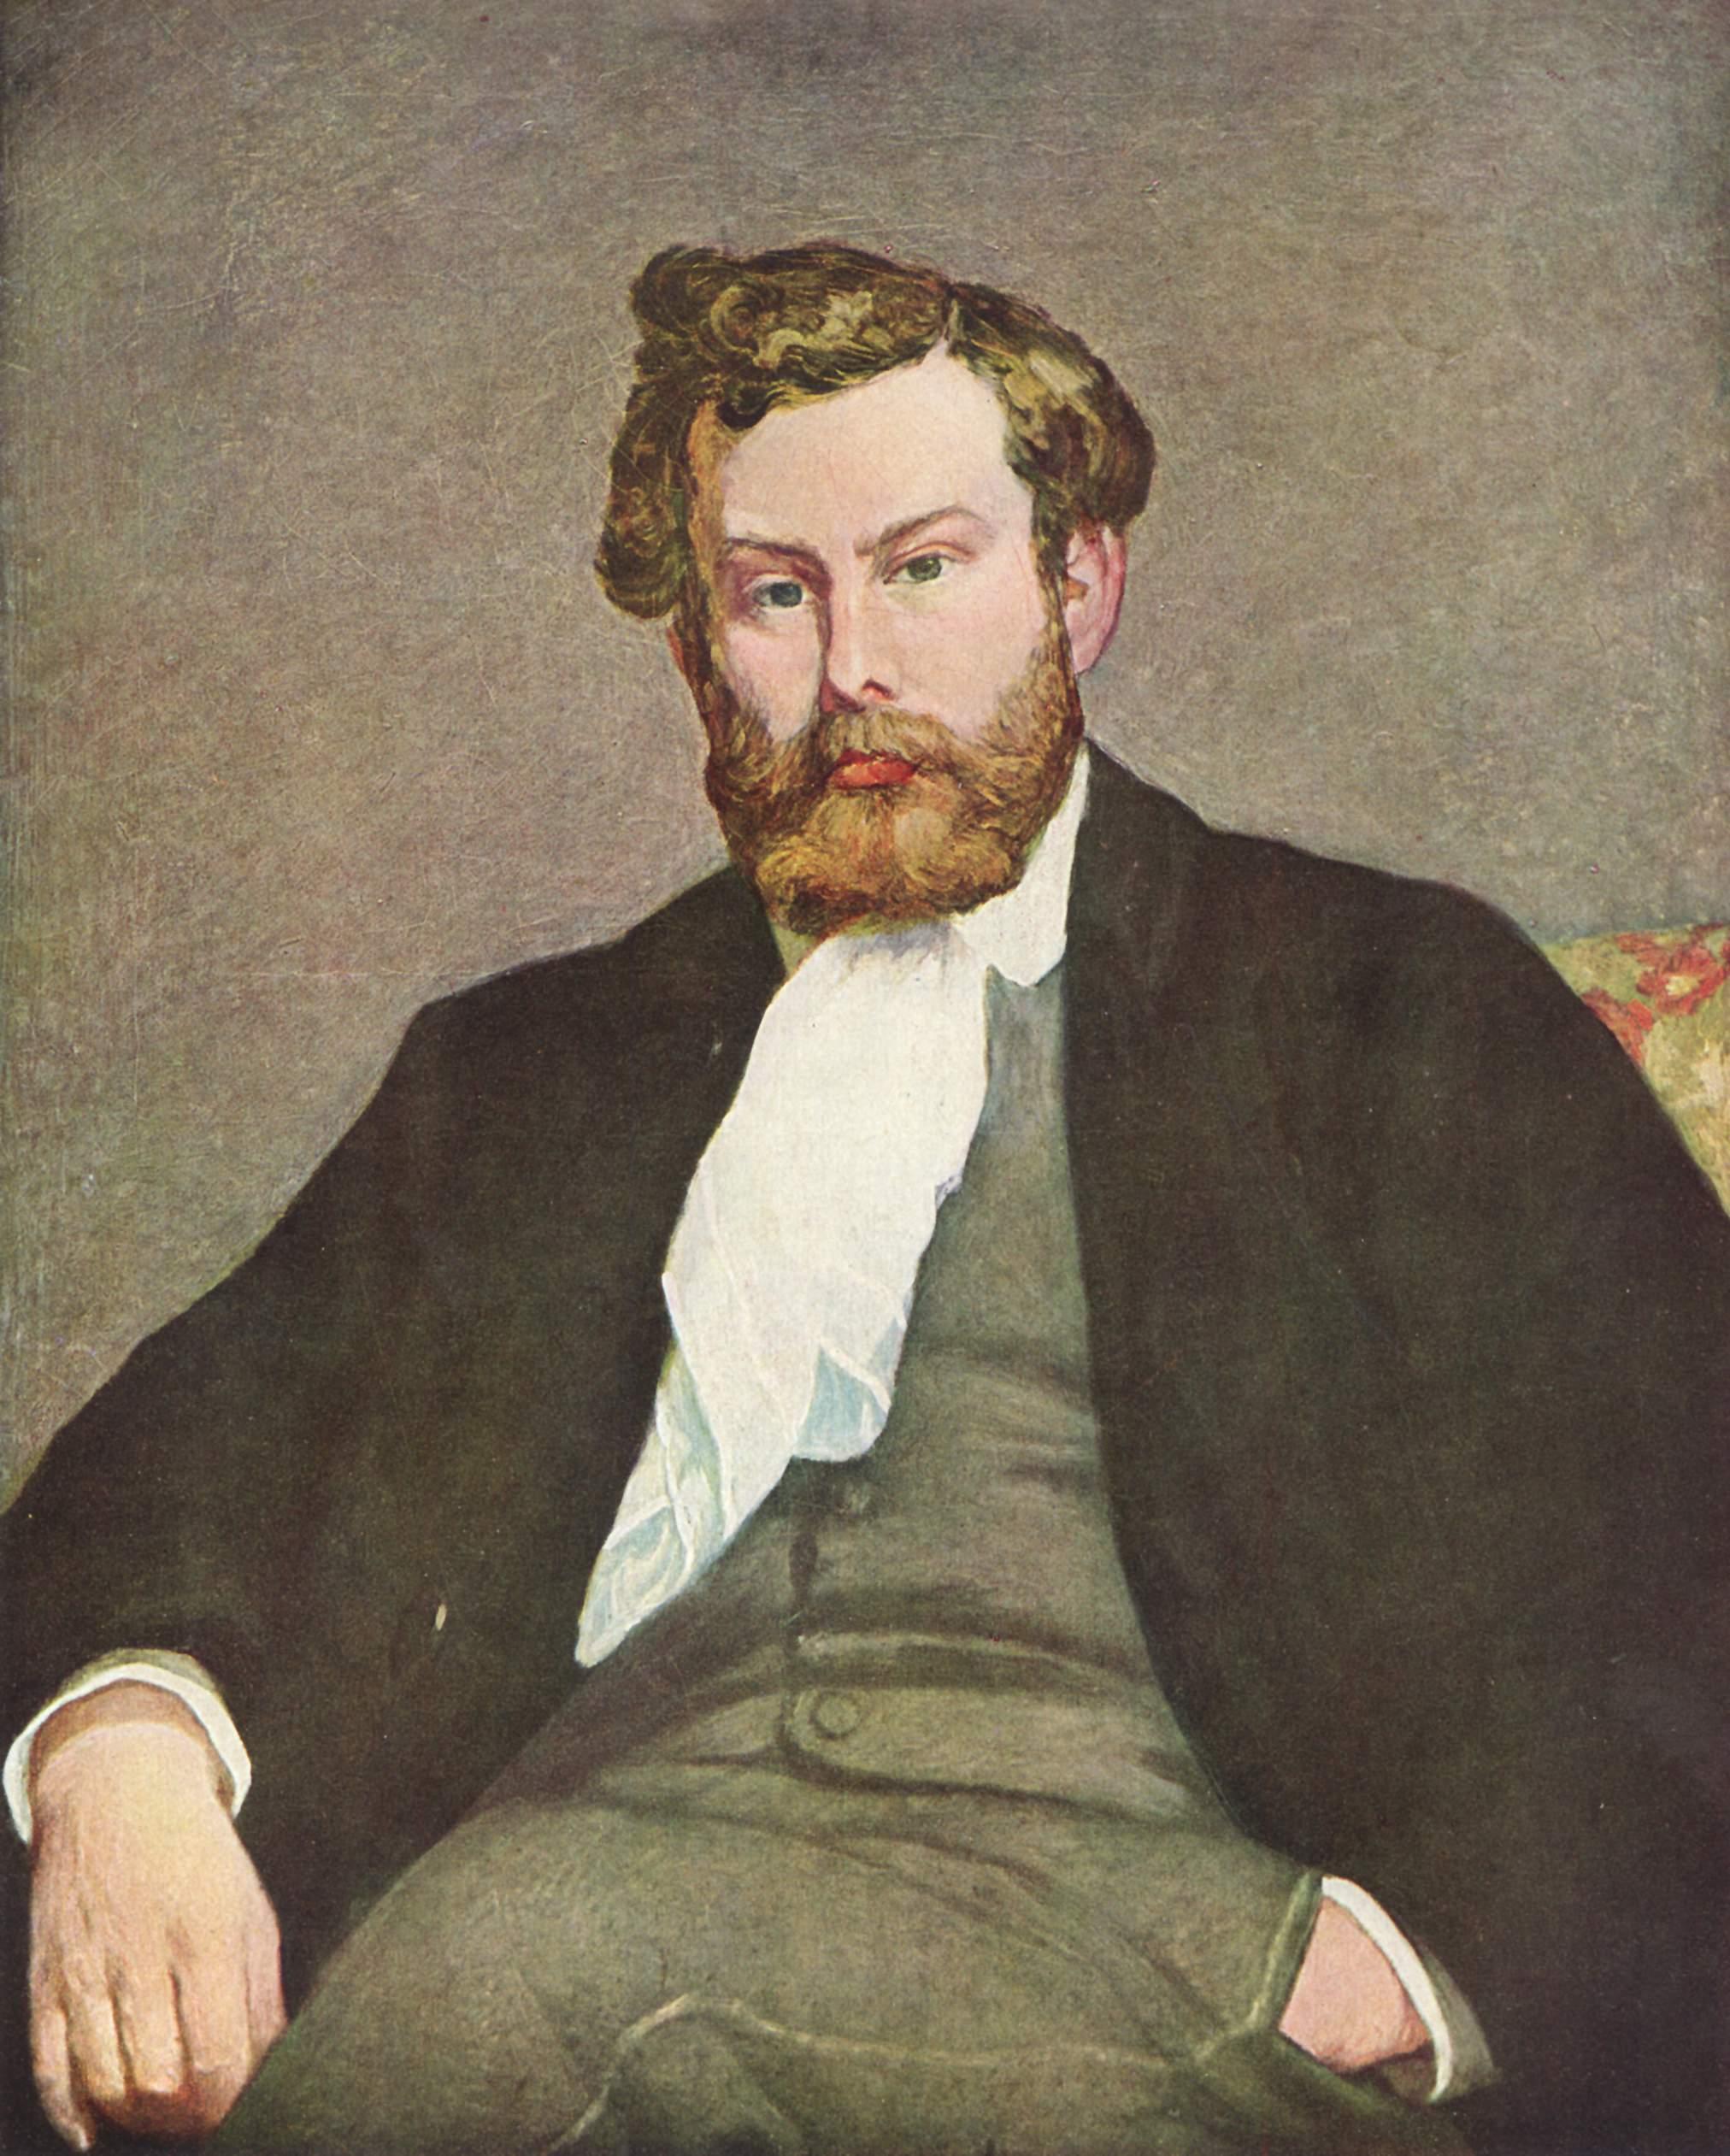 Katie phang attorney wikipedia images - 1842 Karl May German Writer Old Shatterhand Winnetou